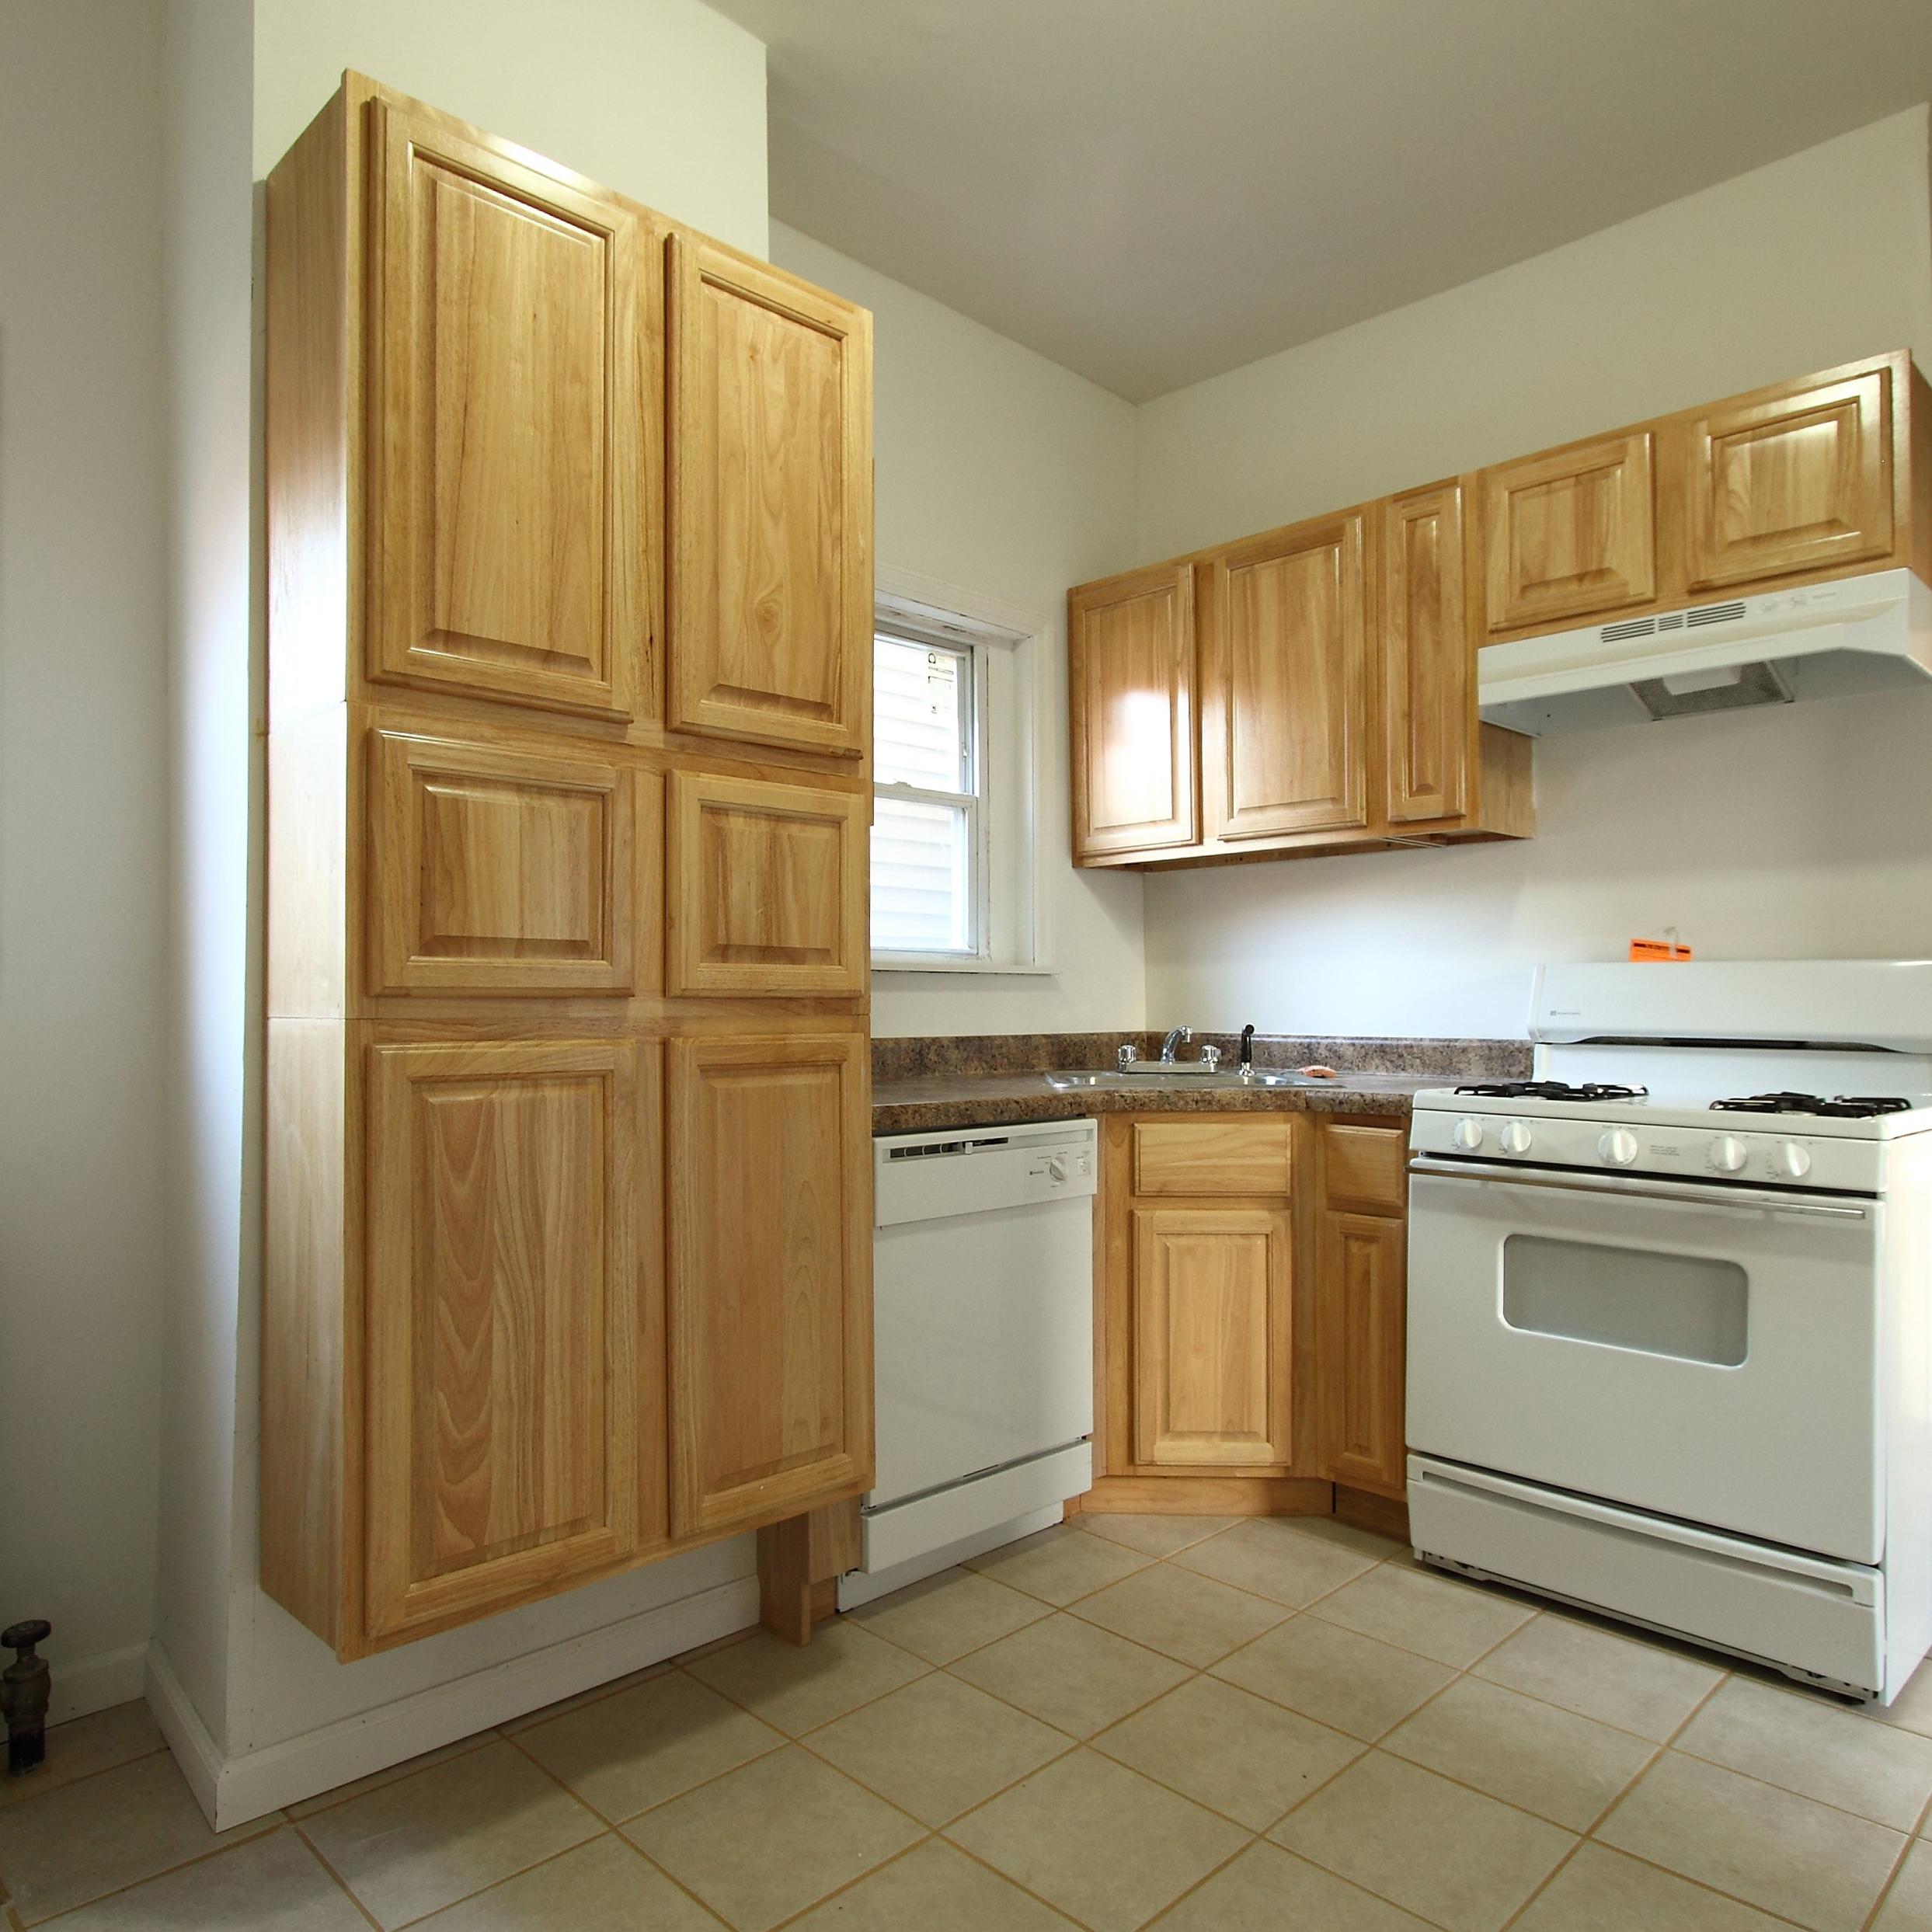 Image of property 136 Dekalb Ave, U1